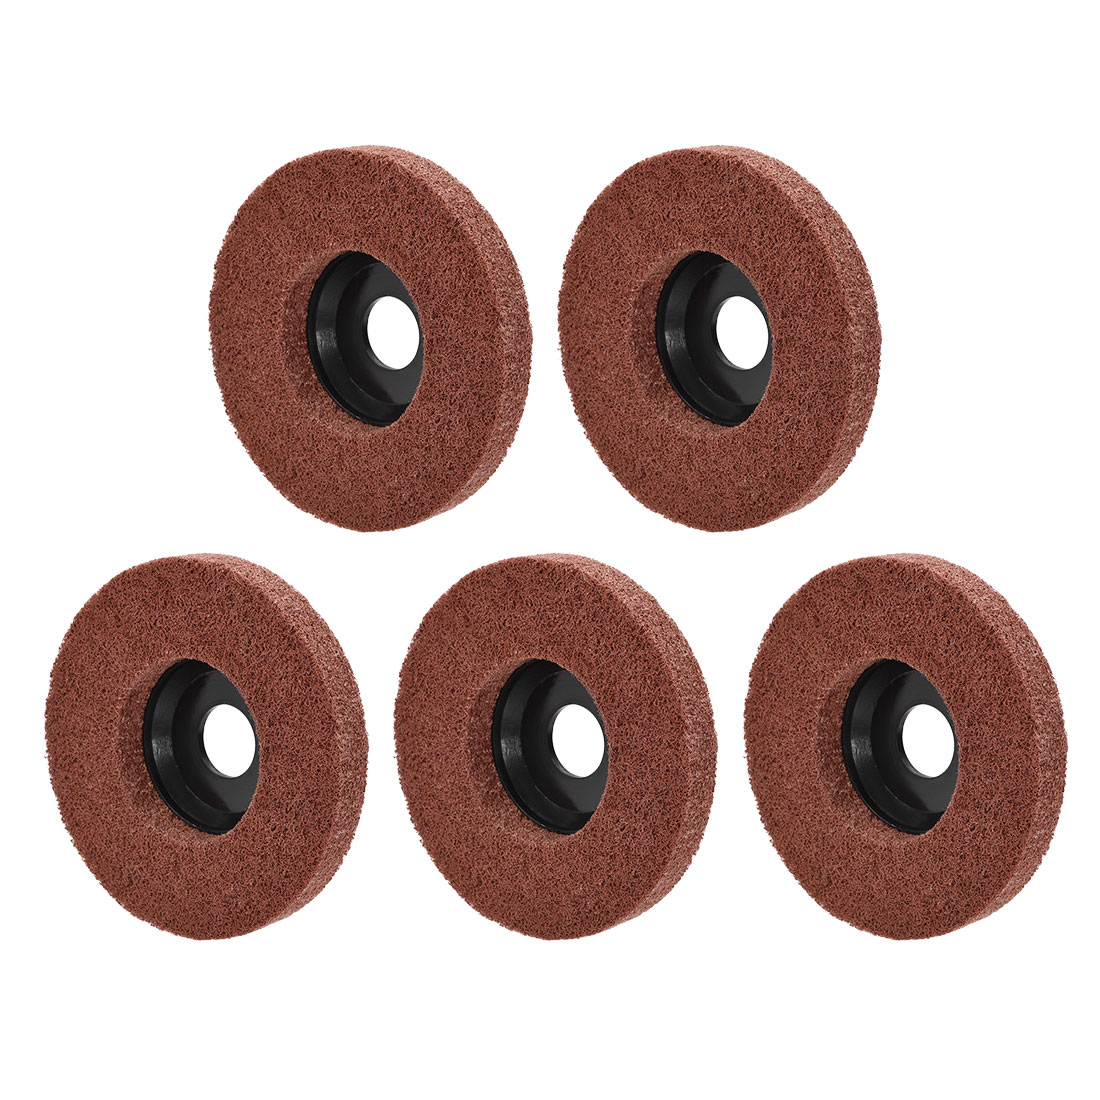 4.5 Inch Polishing Wheel Buffing Pad Felt Disc for 100 Angle Grinders Black 5pcs